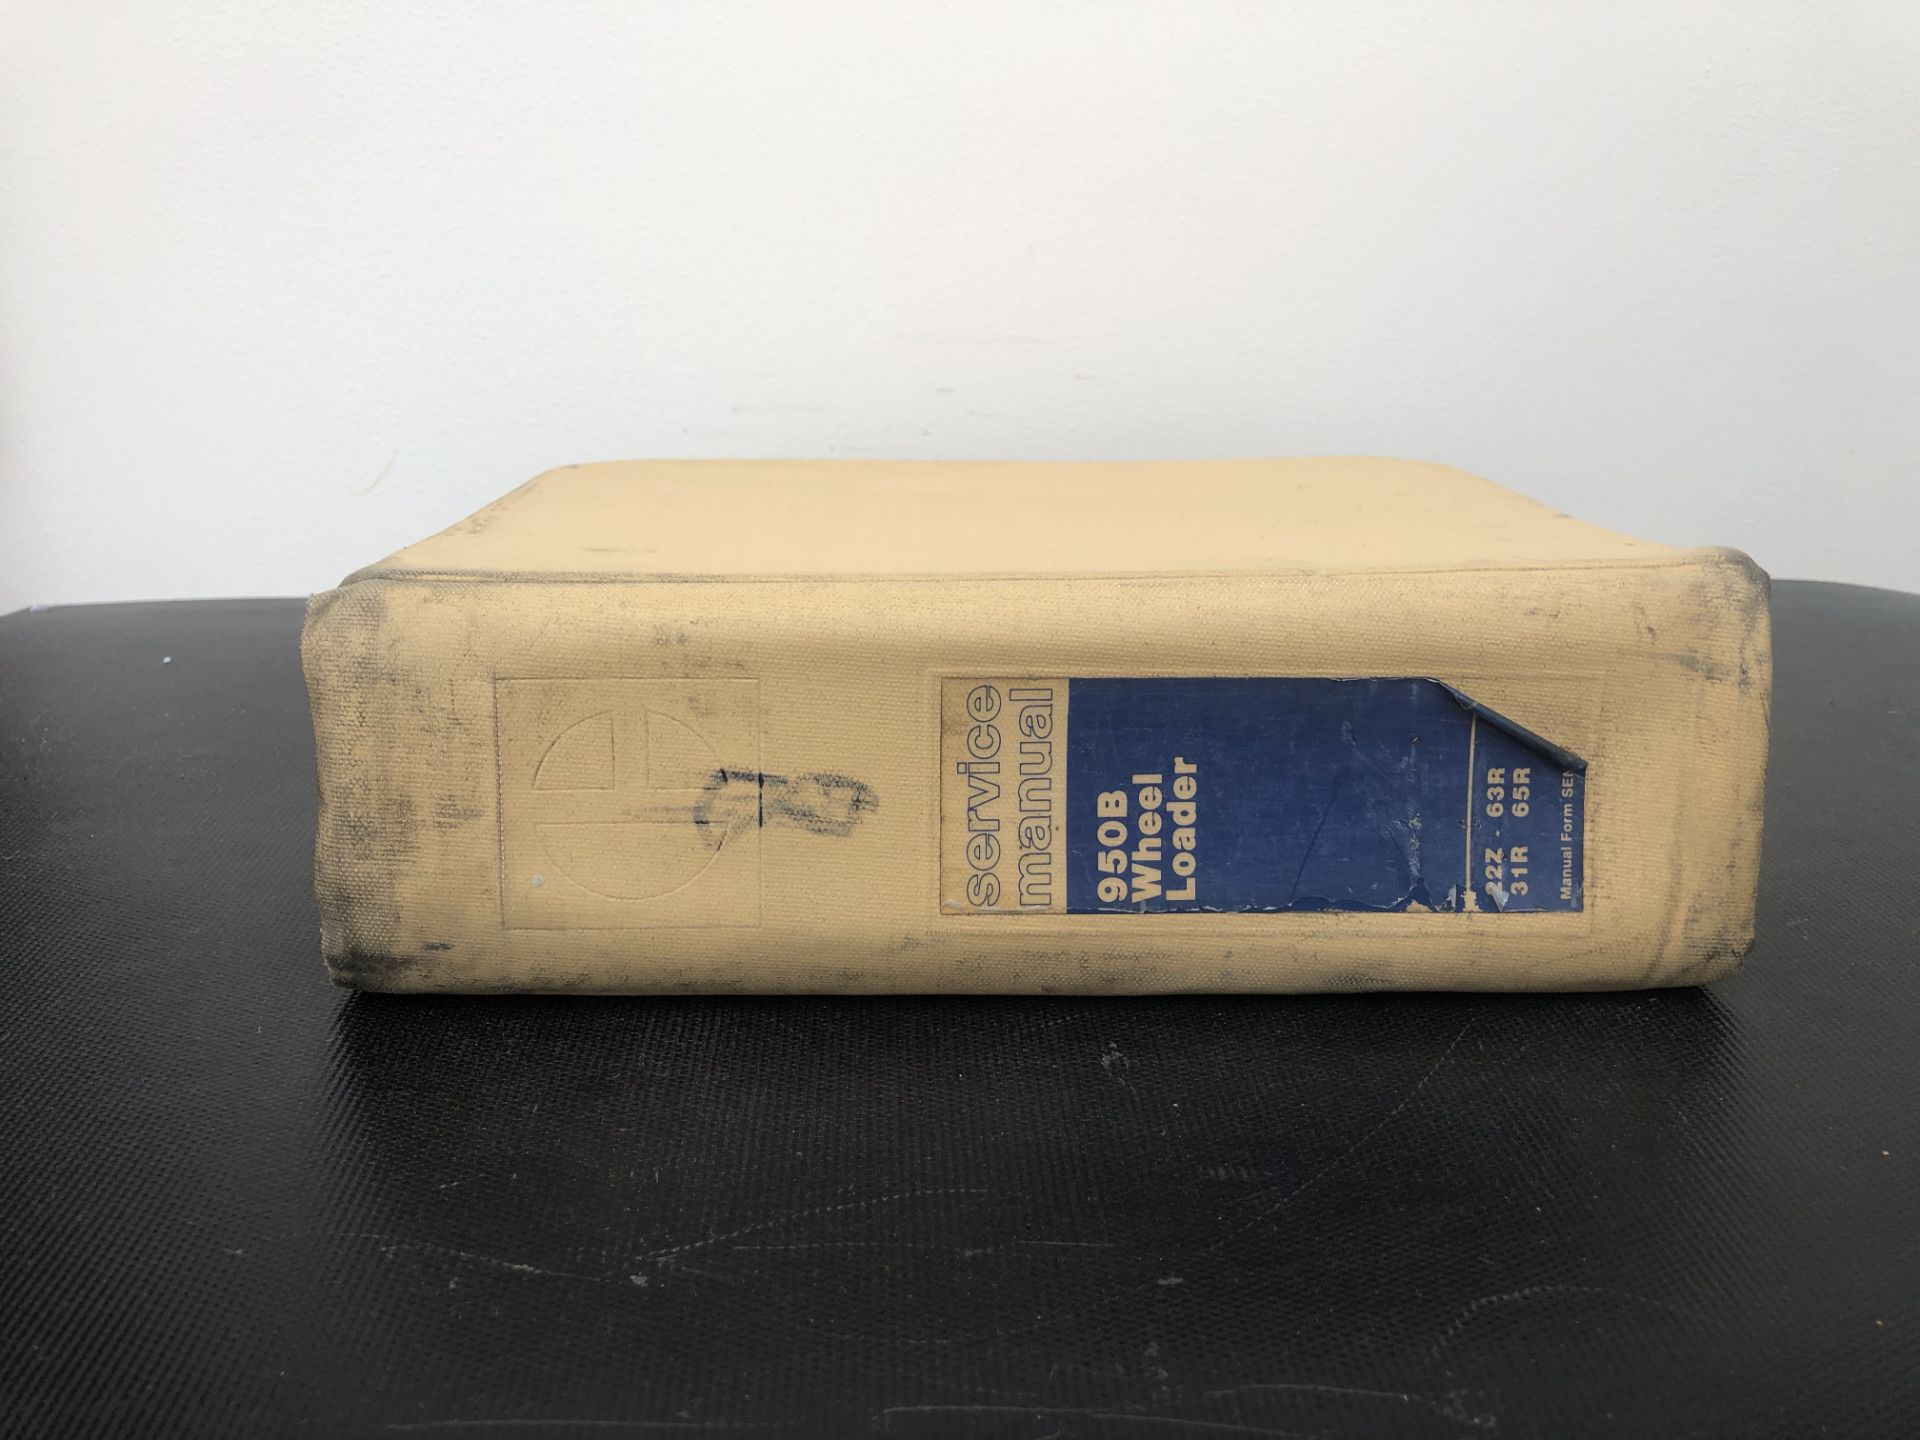 CATERPILLAR 950B BOOK 4 SERVICE MANUAL, GENUINE FACTORY CAT WORKSHOP MANUAL